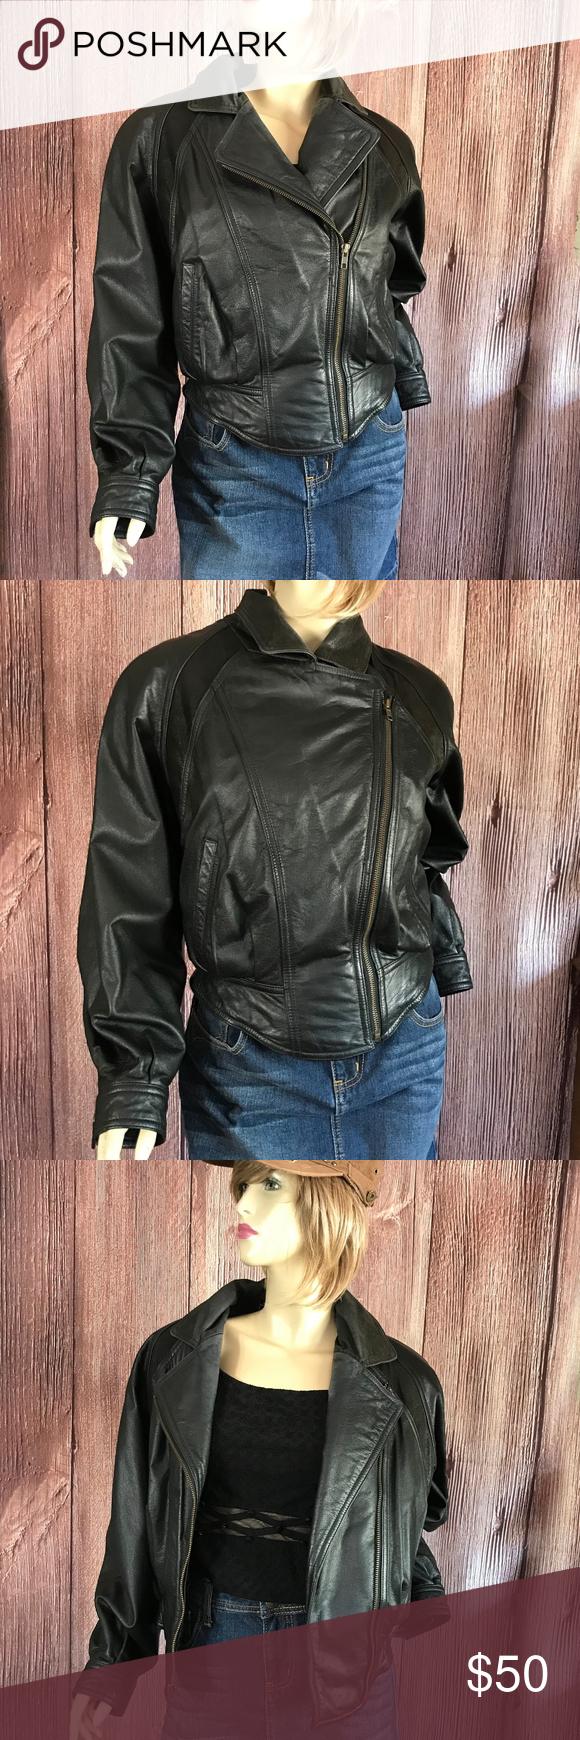 Thinsulate Wilsons Leather Moto Bomber Jacket XS Wilsons